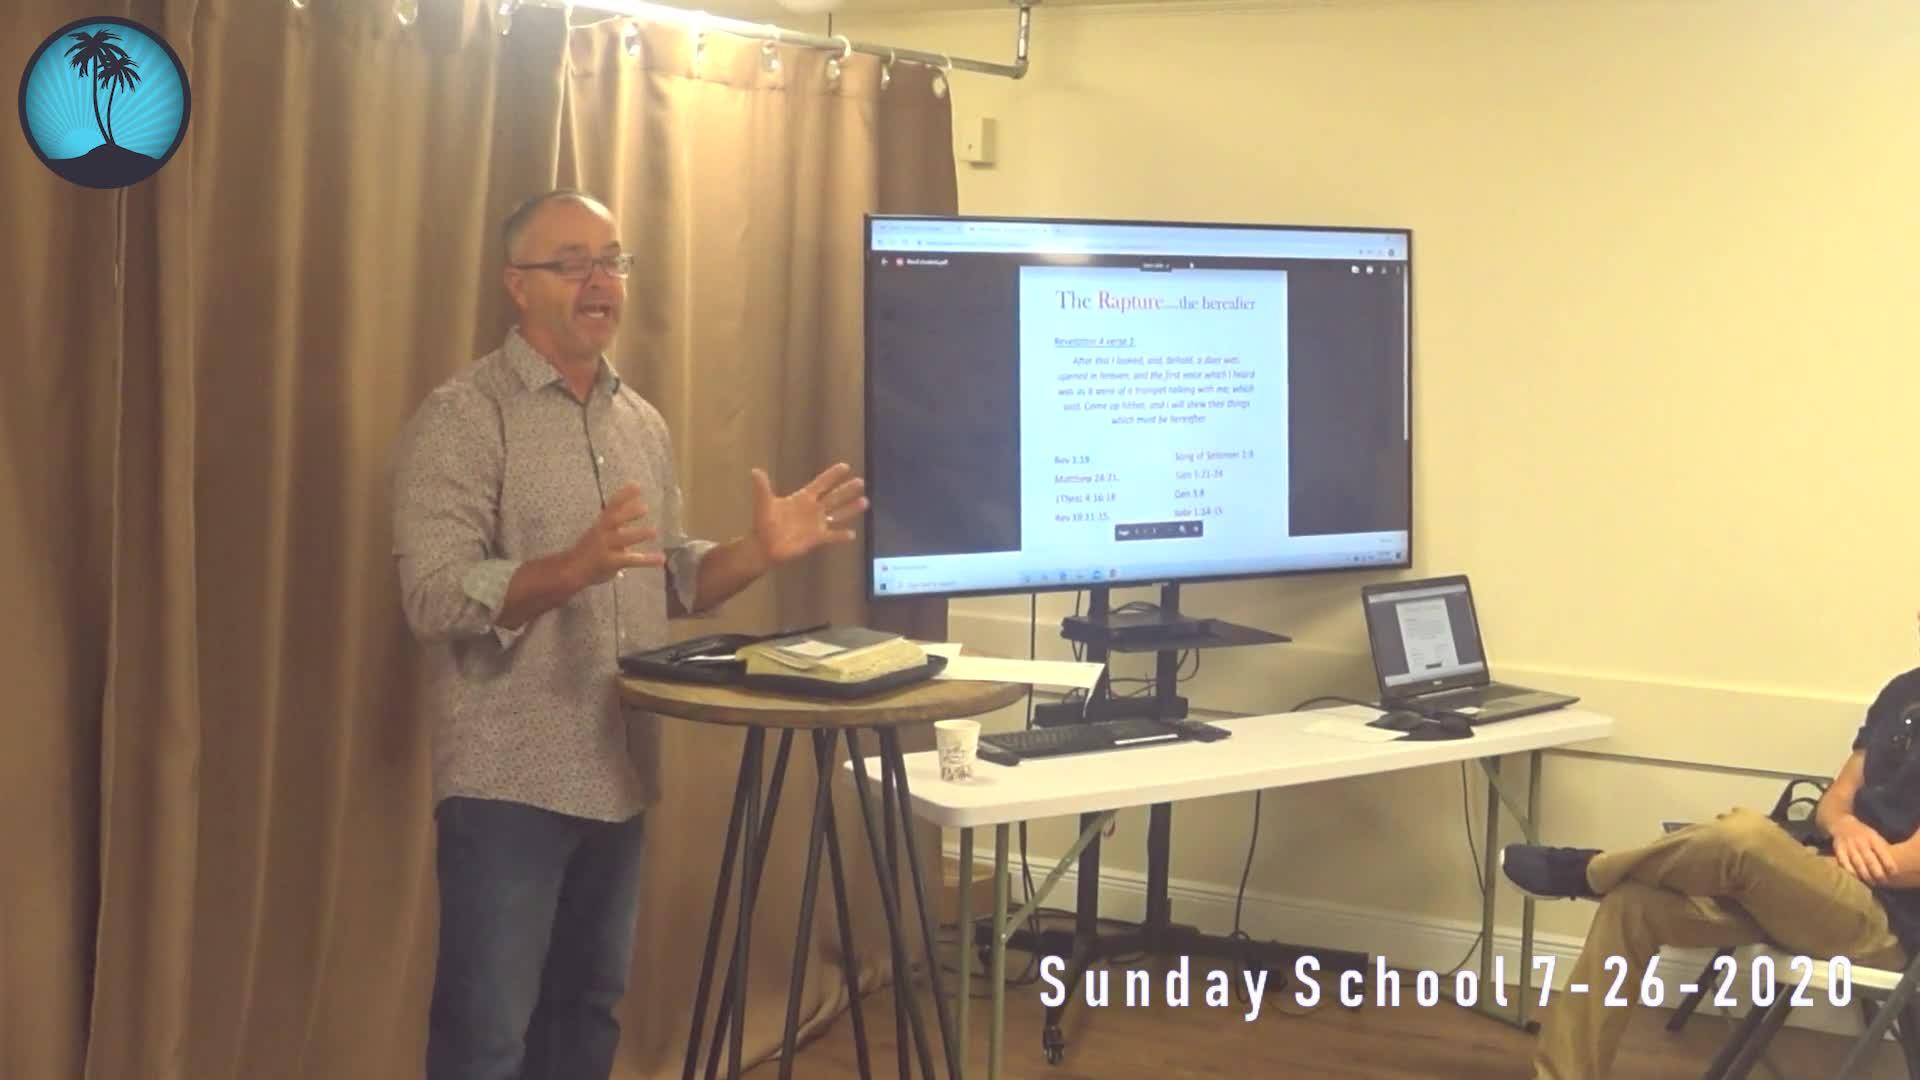 Sunday School 2nd Service